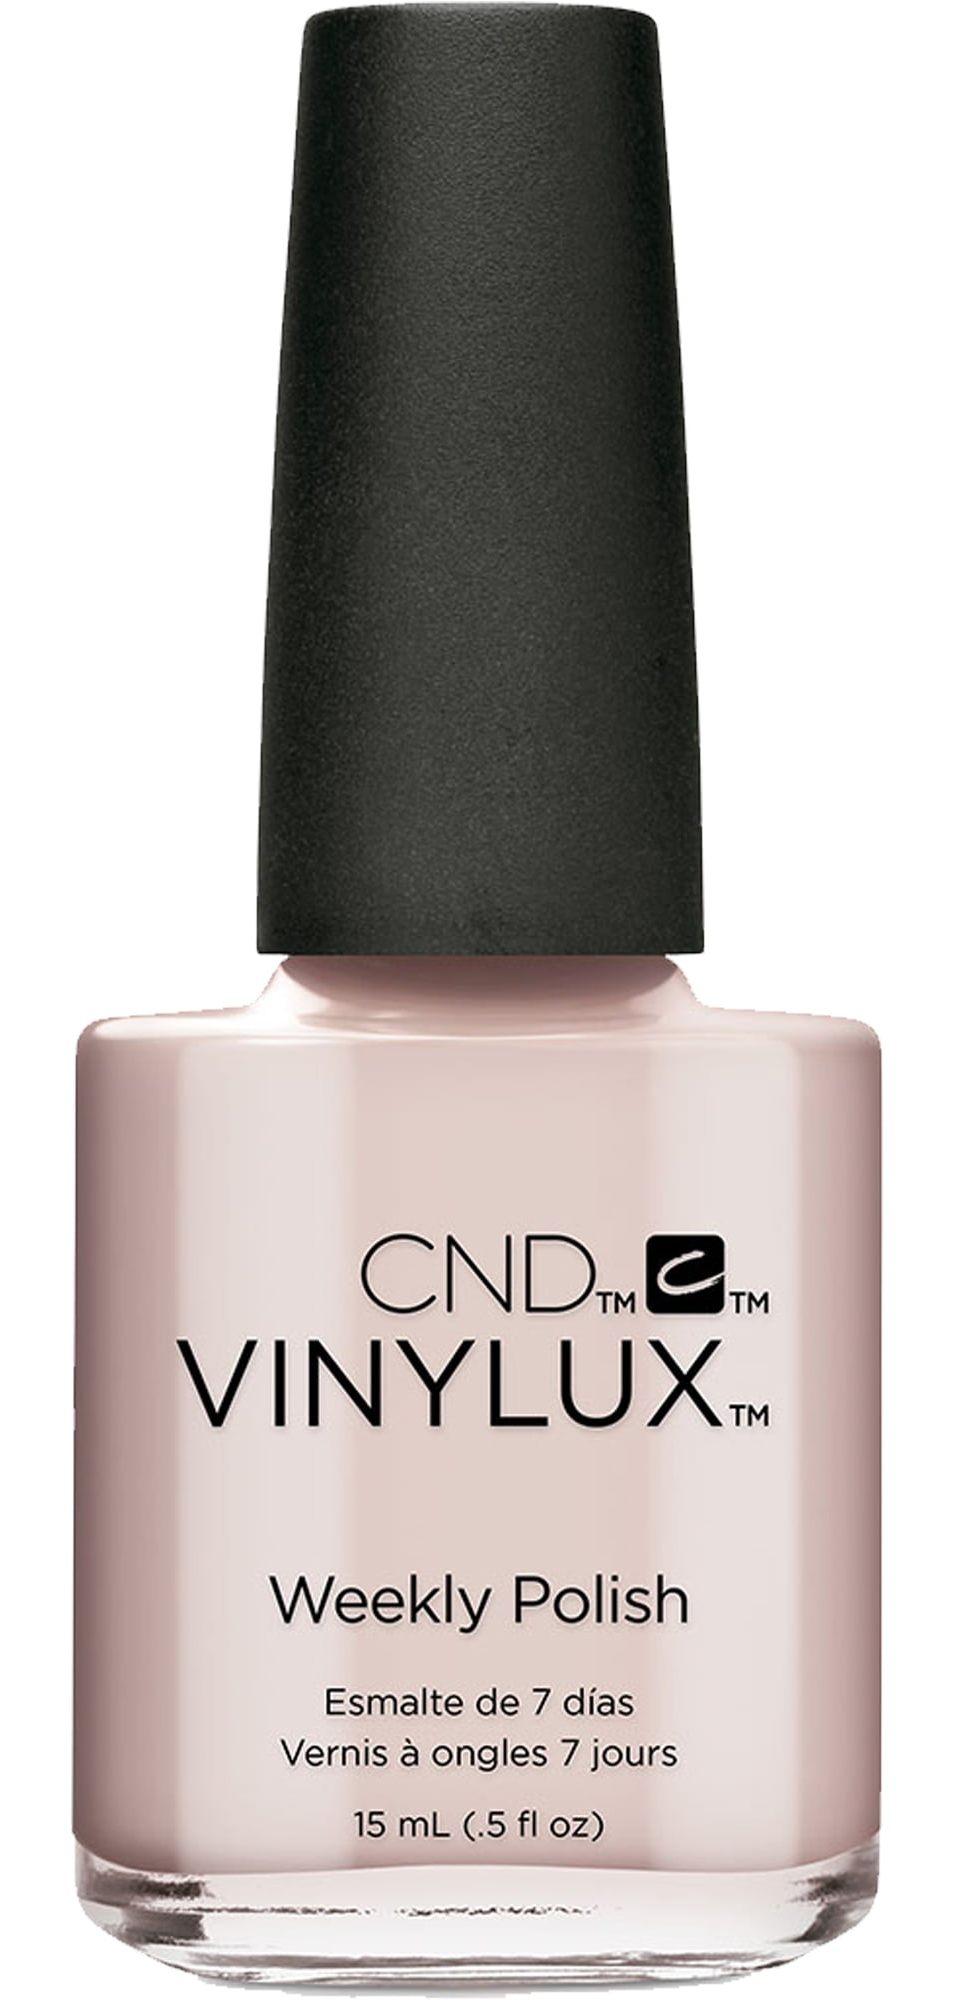 CND 259 лак недельный для ногтей / Cashmere Wrap VINYLUX Glasial Illusion Collection 15 мл